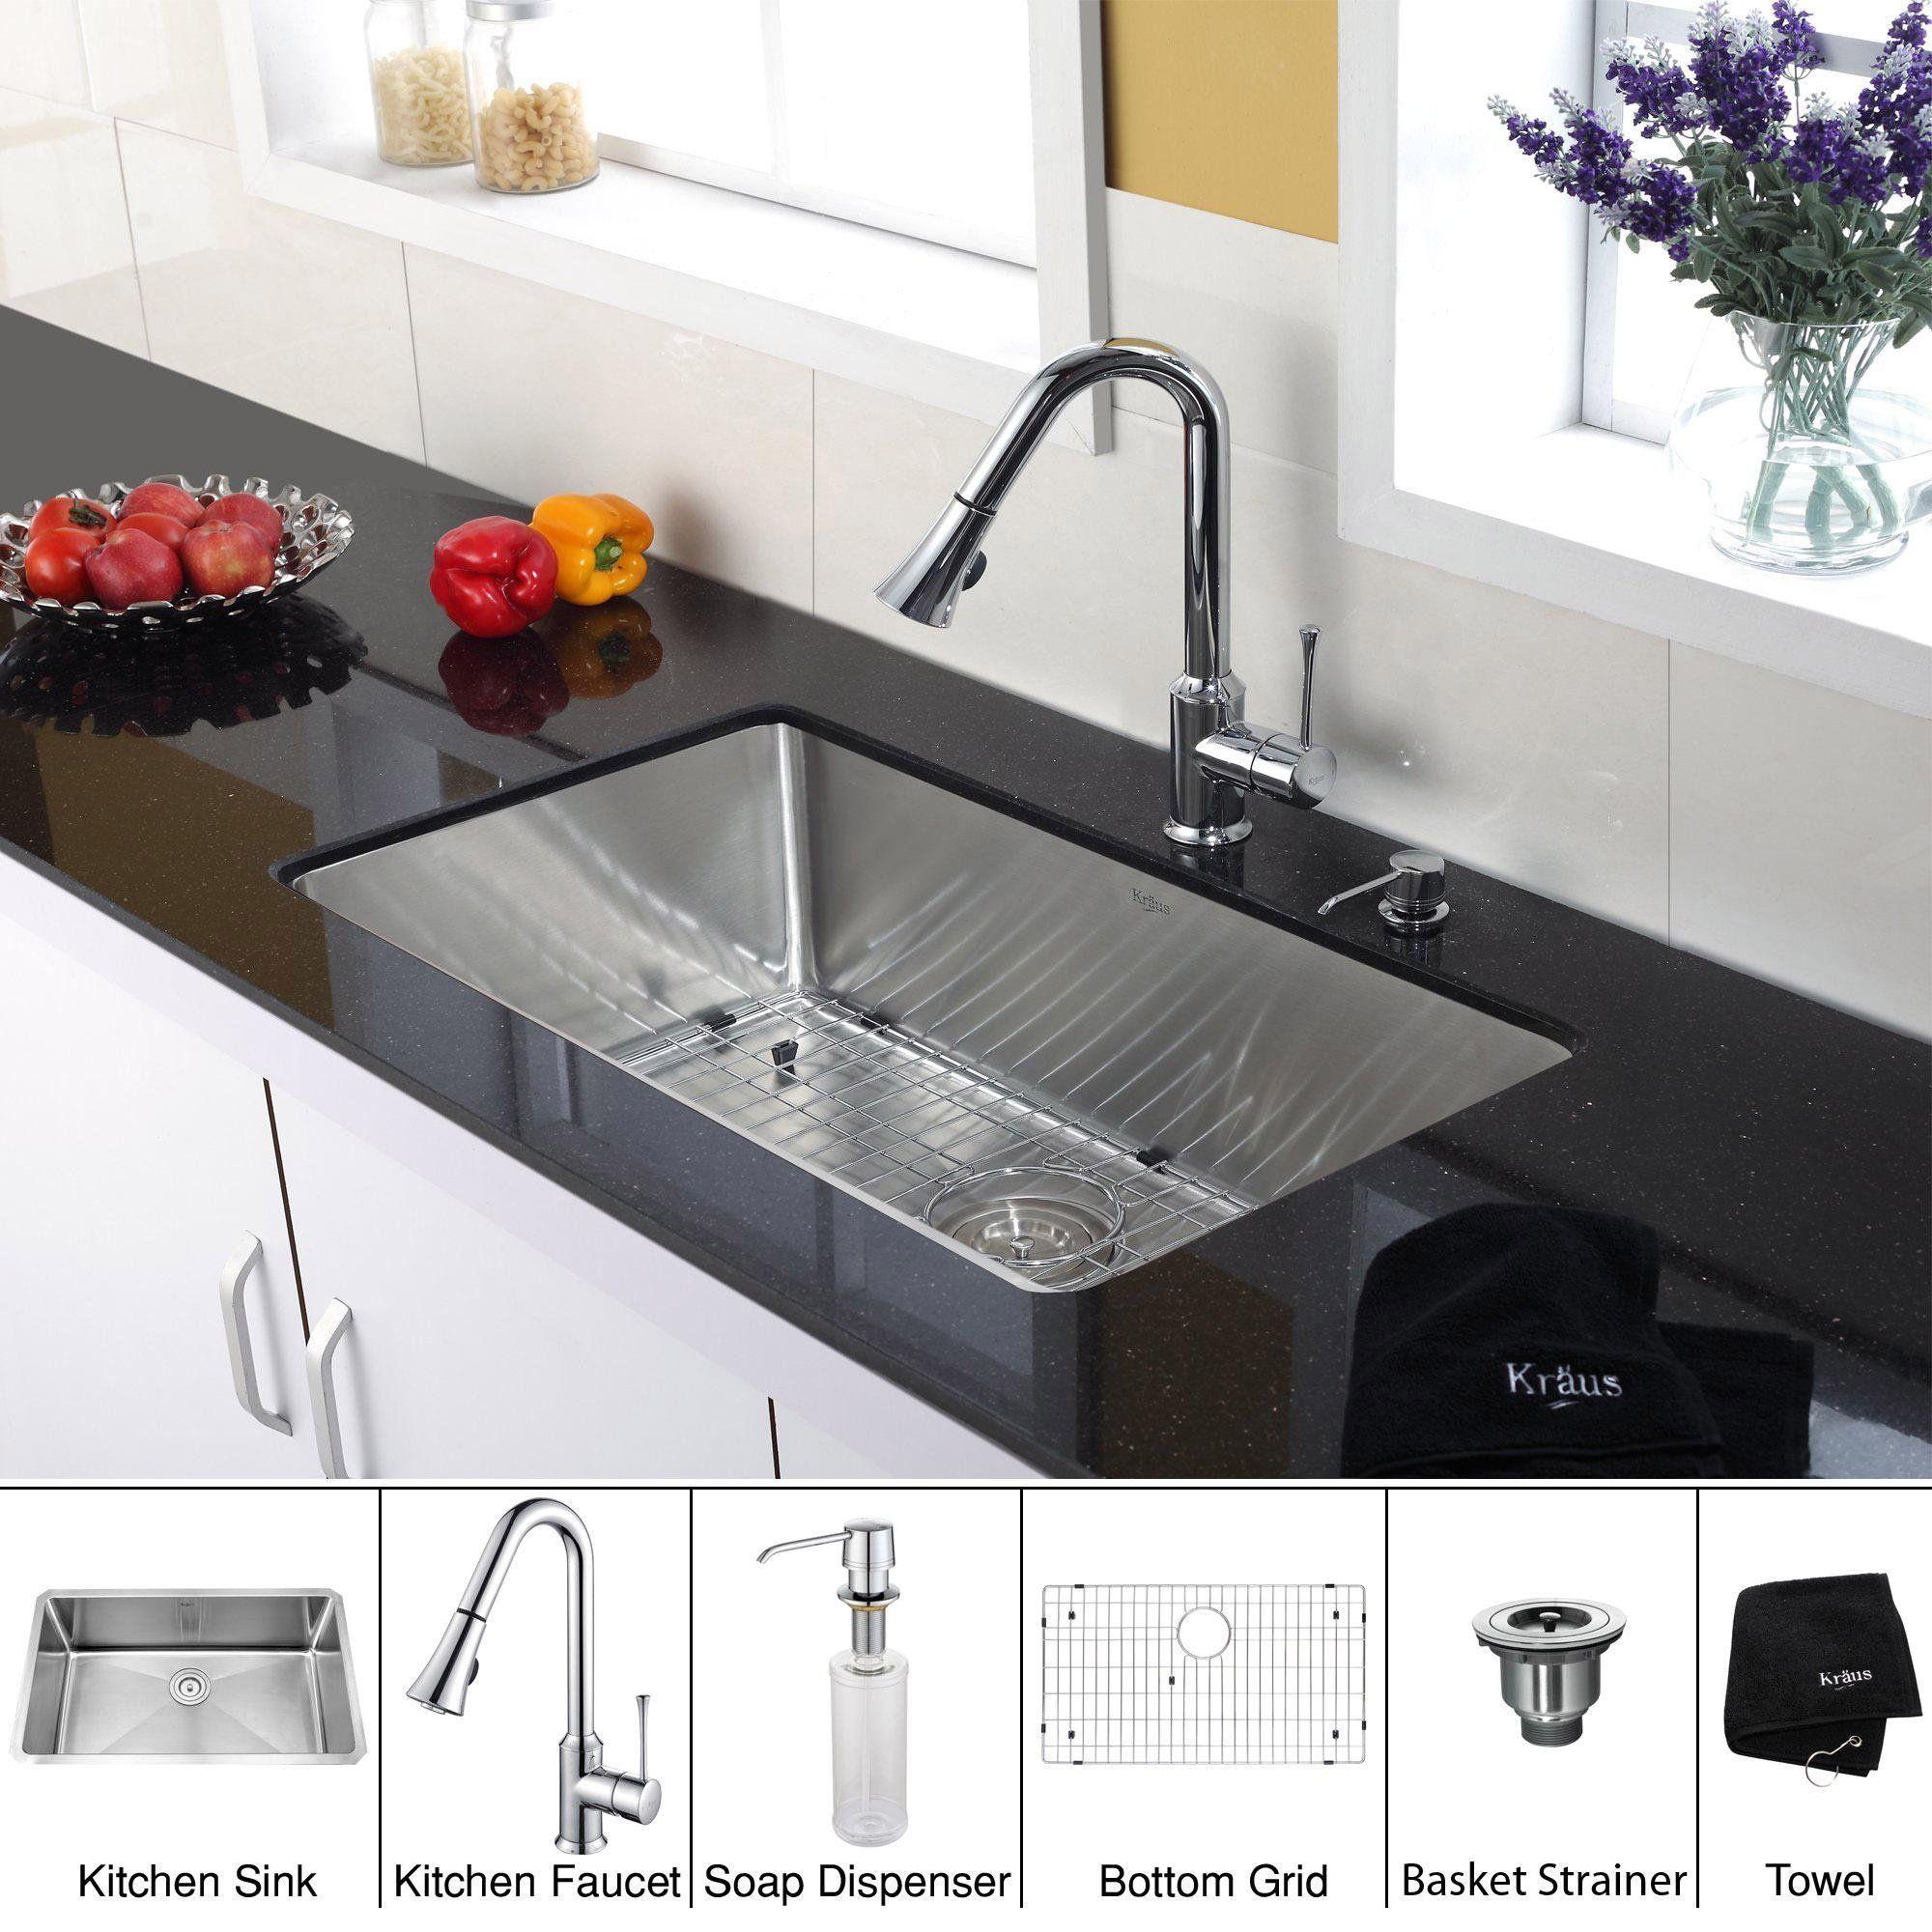 Kraus Khu100 30 Kpf1650 Ksd30ch 30 Quot Undermount Single Bowl 16 Gauge Stainless Steel Kit Chrome Kitchen Faucet Kitchen Sink Design Single Bowl Kitchen Sink